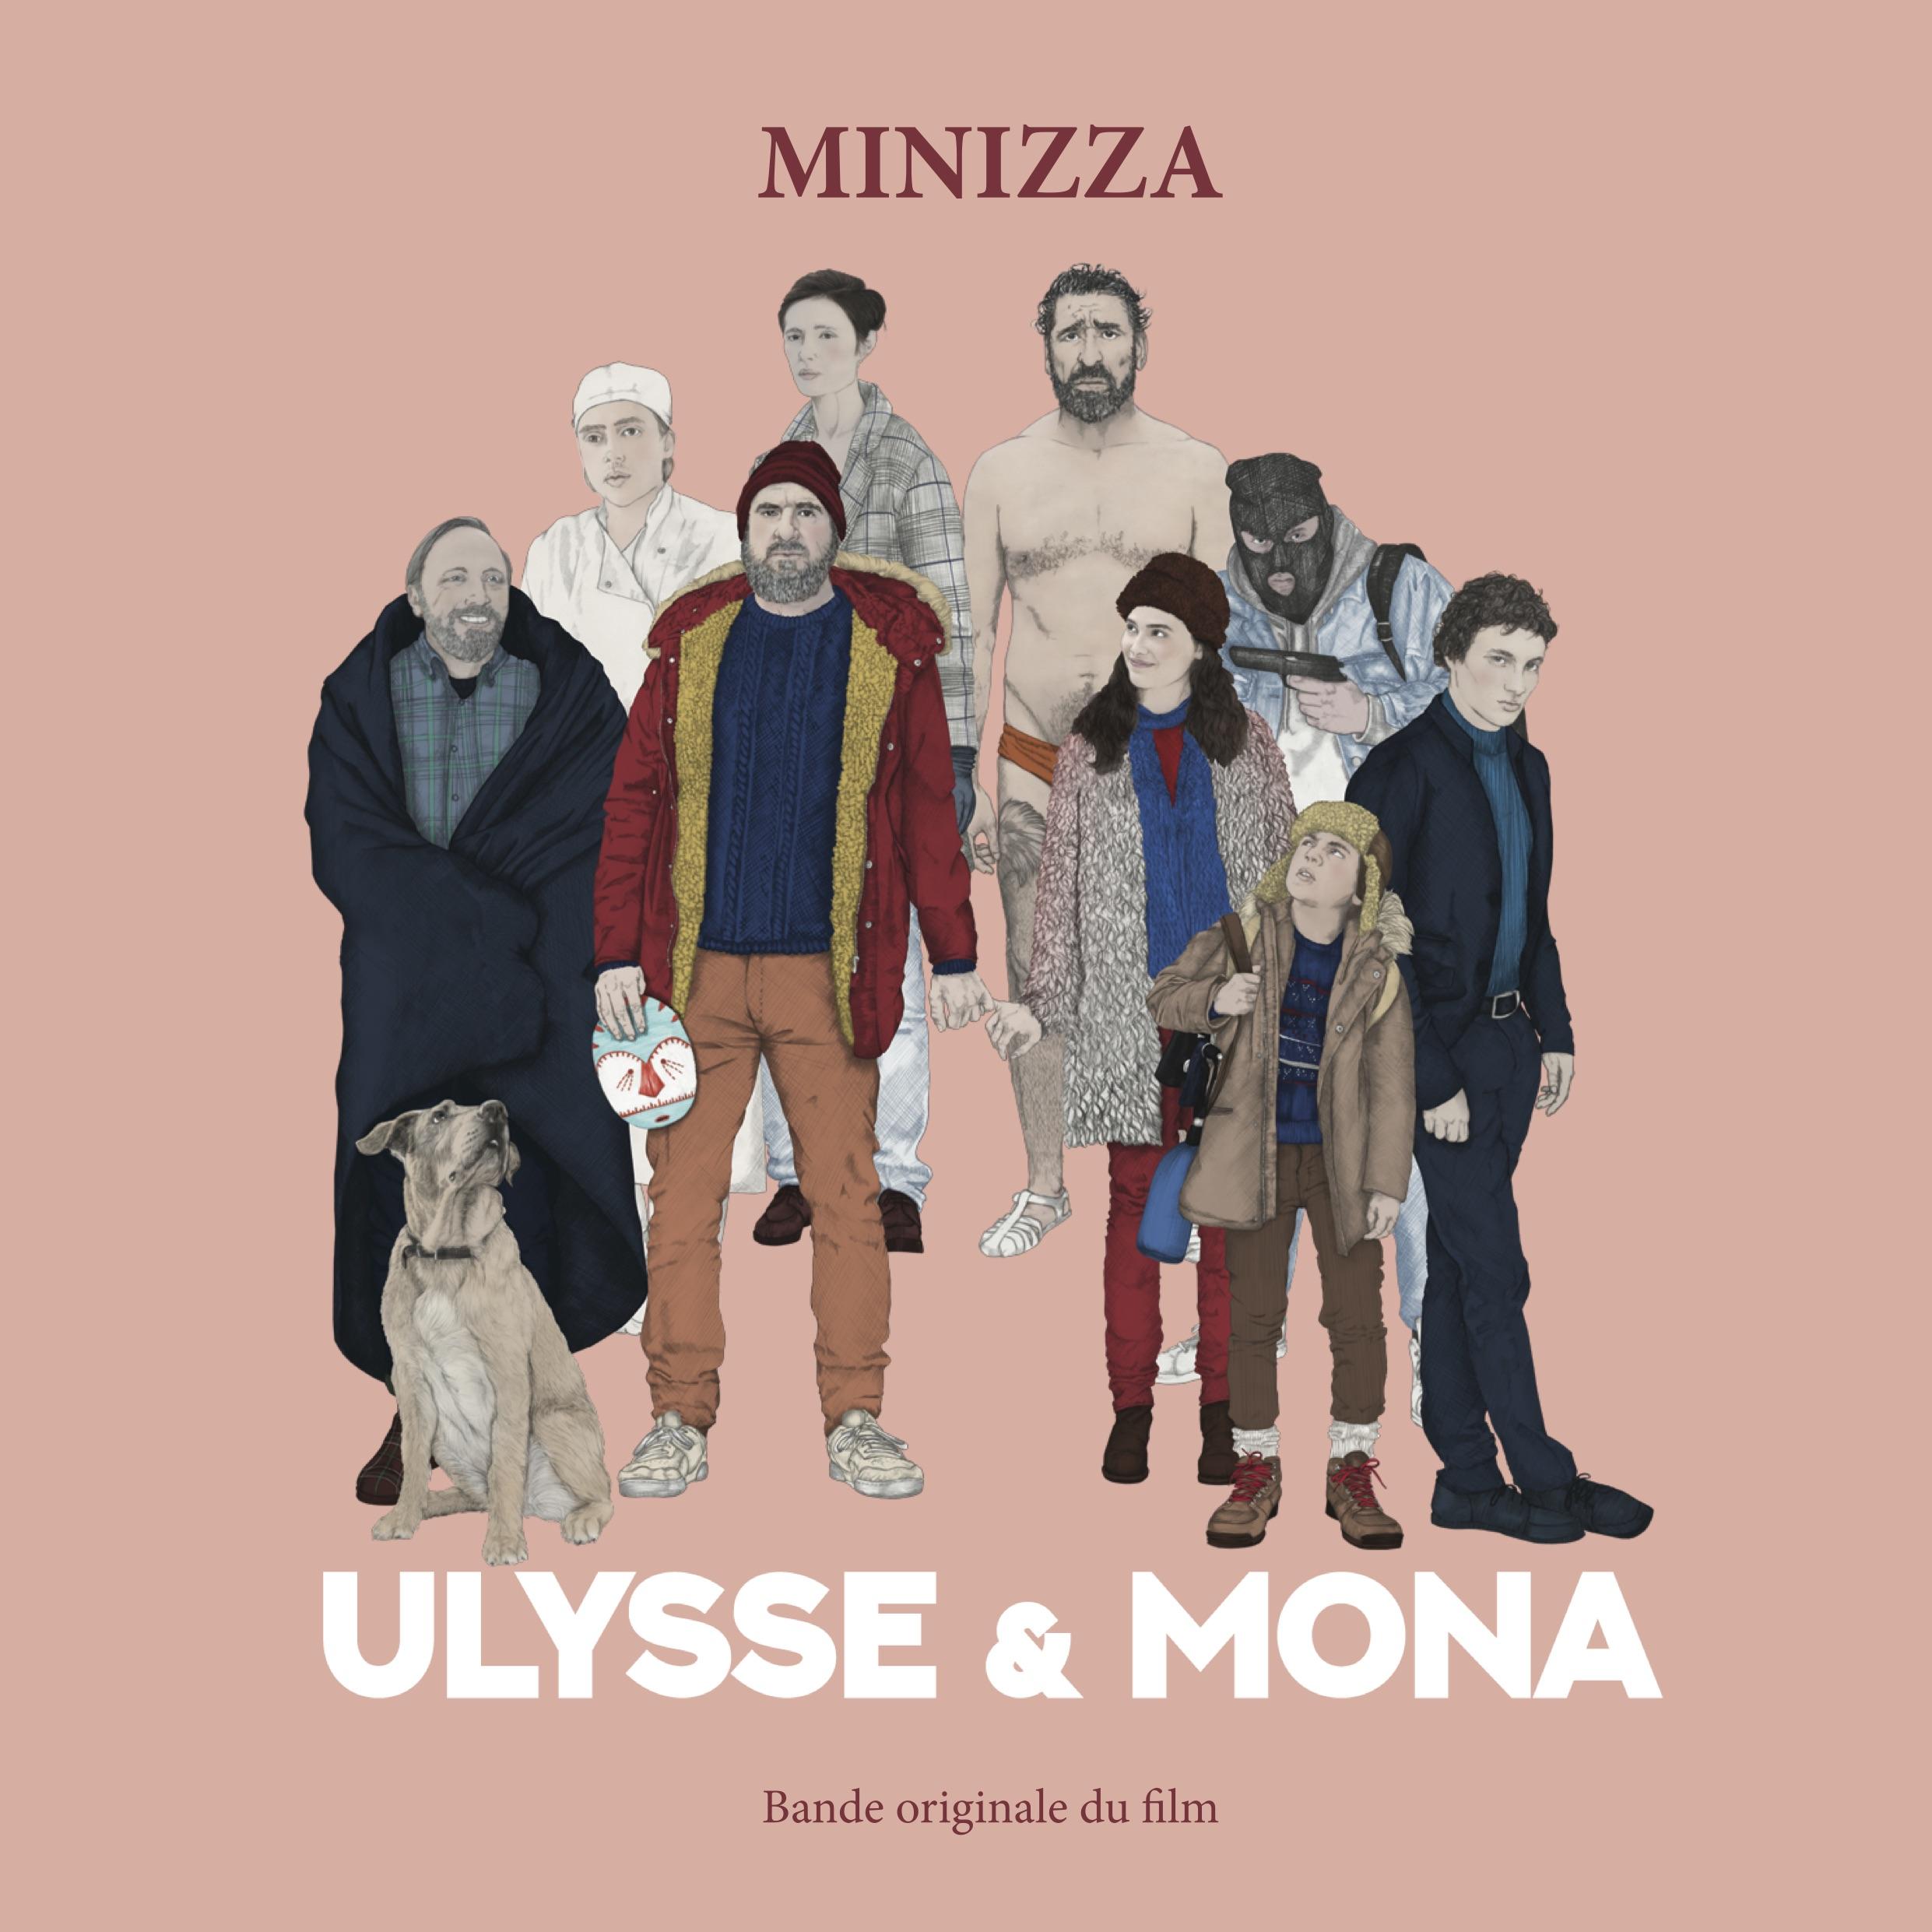 Minizza ulysse et mona